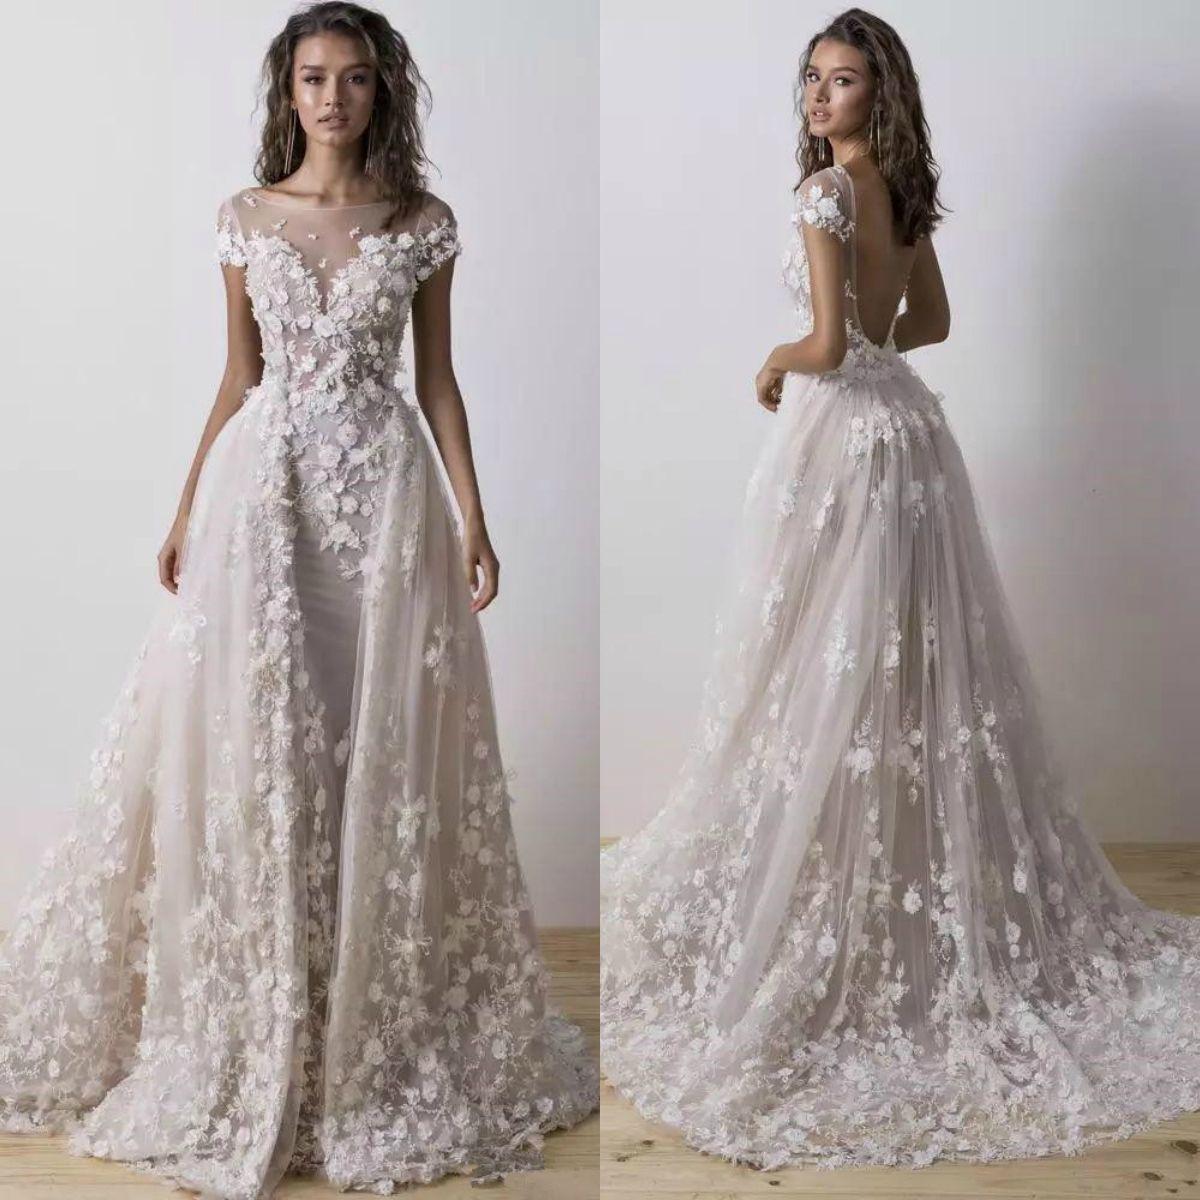 3795895fac7 Berta 2019 Mermaid Wedding Dresses With Detachable Train 3D Floral  Appliqued Lace Bridal Gowns Vestido De Novia Country Style Wedding Dress  Designer Wedding ...